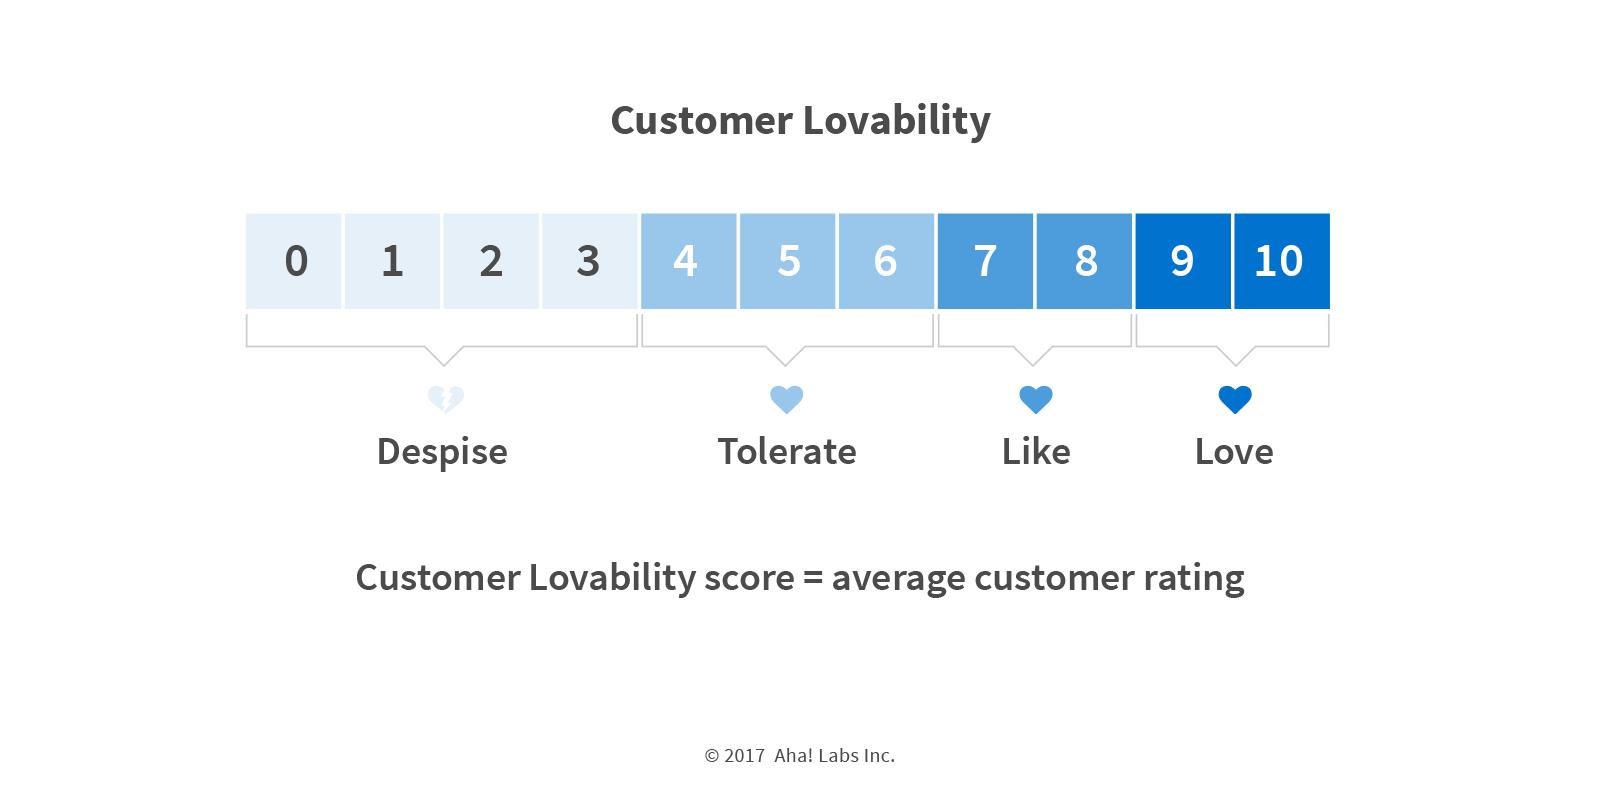 Aha! customer lovability score